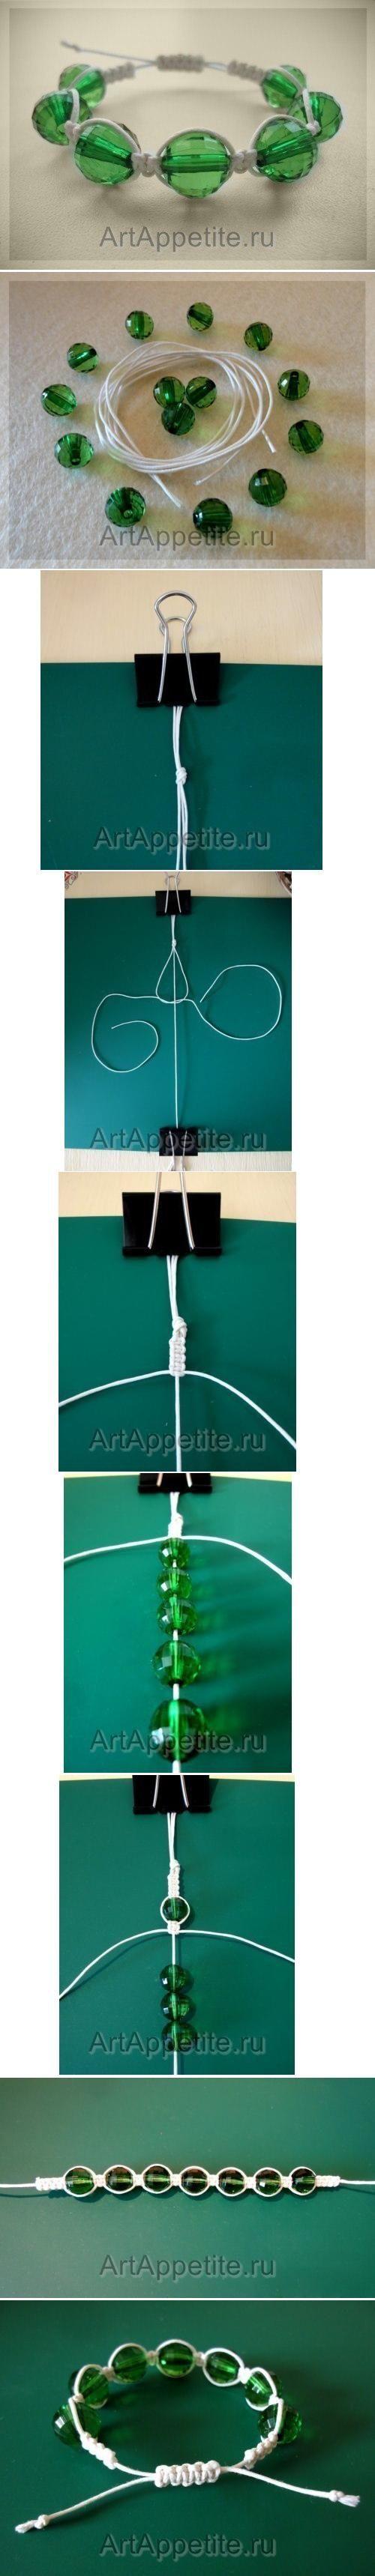 DIY Weave Bracelet Shambhala DIY Weave Bracelet Shambhala by diyforever